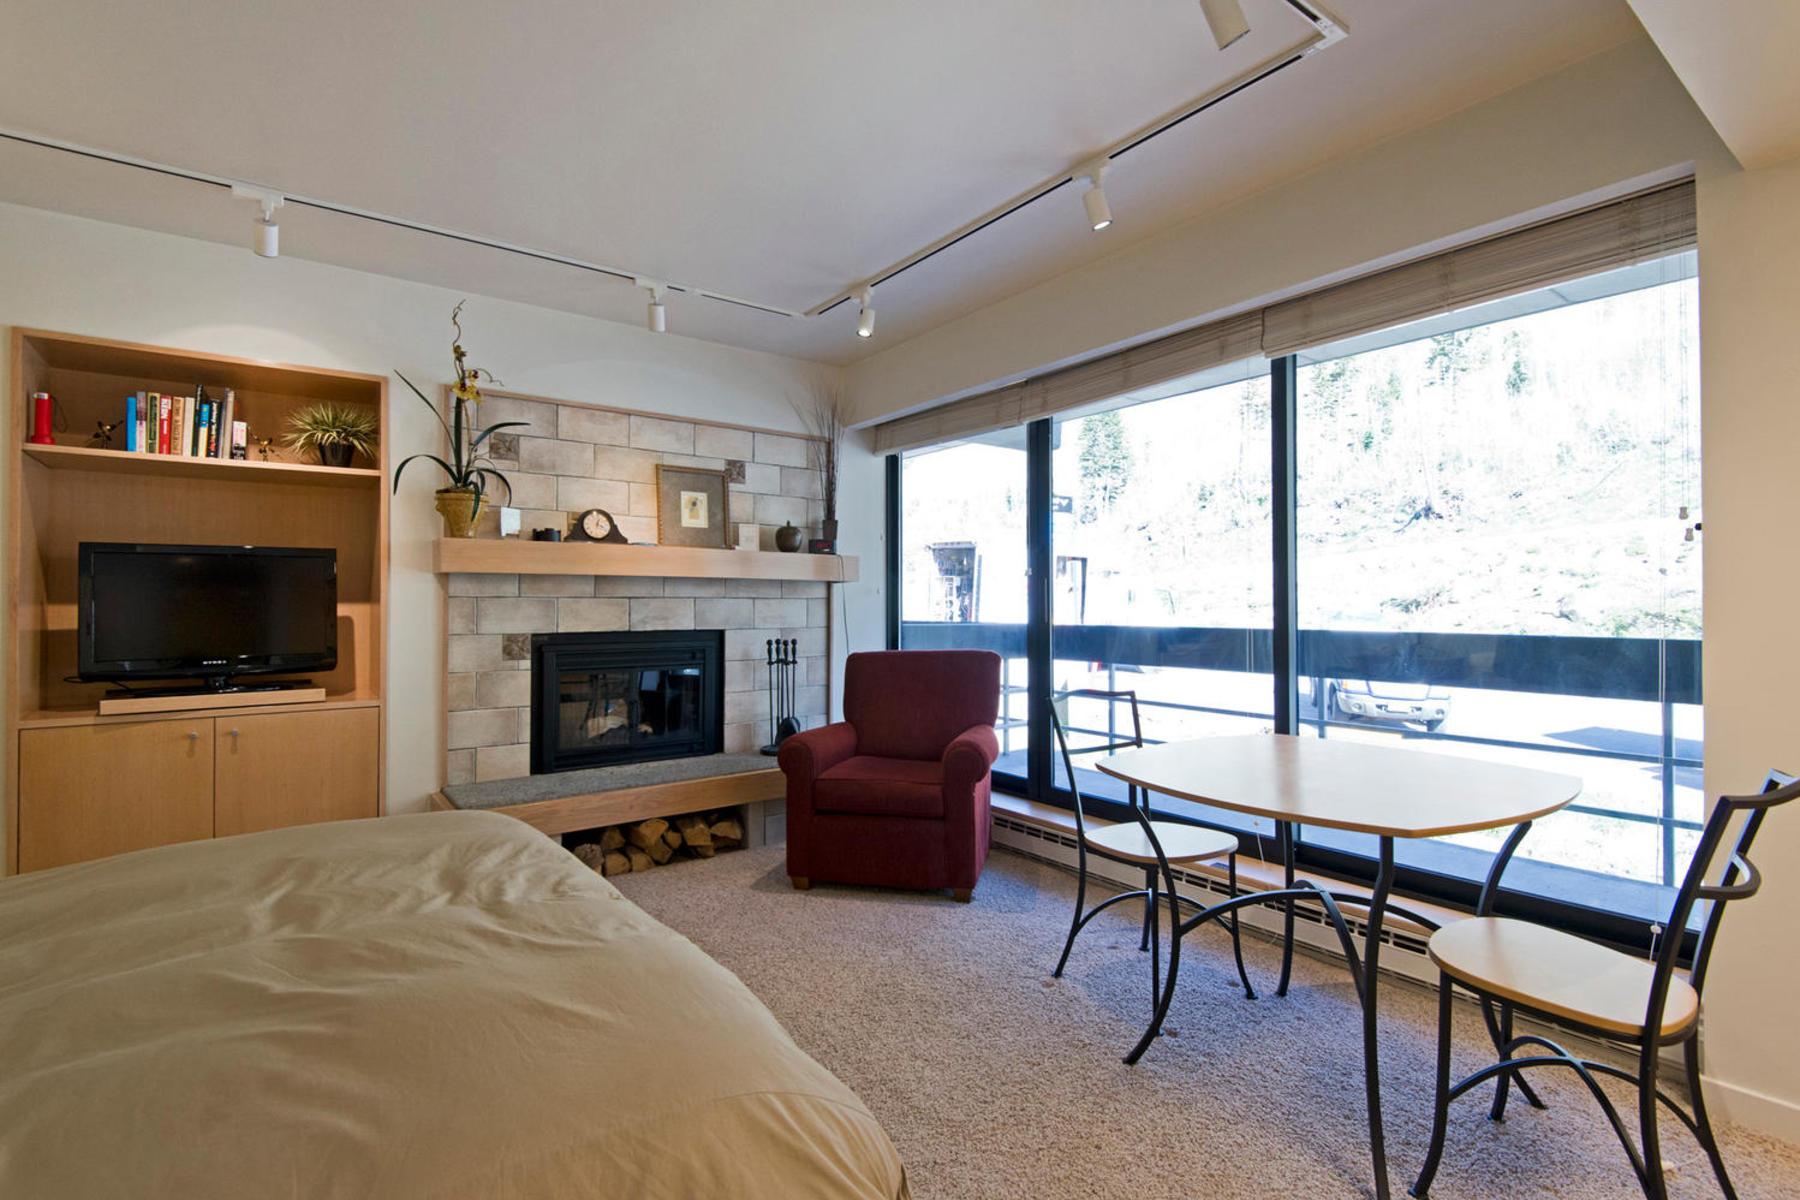 Additional photo for property listing at Darling Snowbird Condo 9202 E Lodge Dr #511 Snowbird, Utah 84092 United States